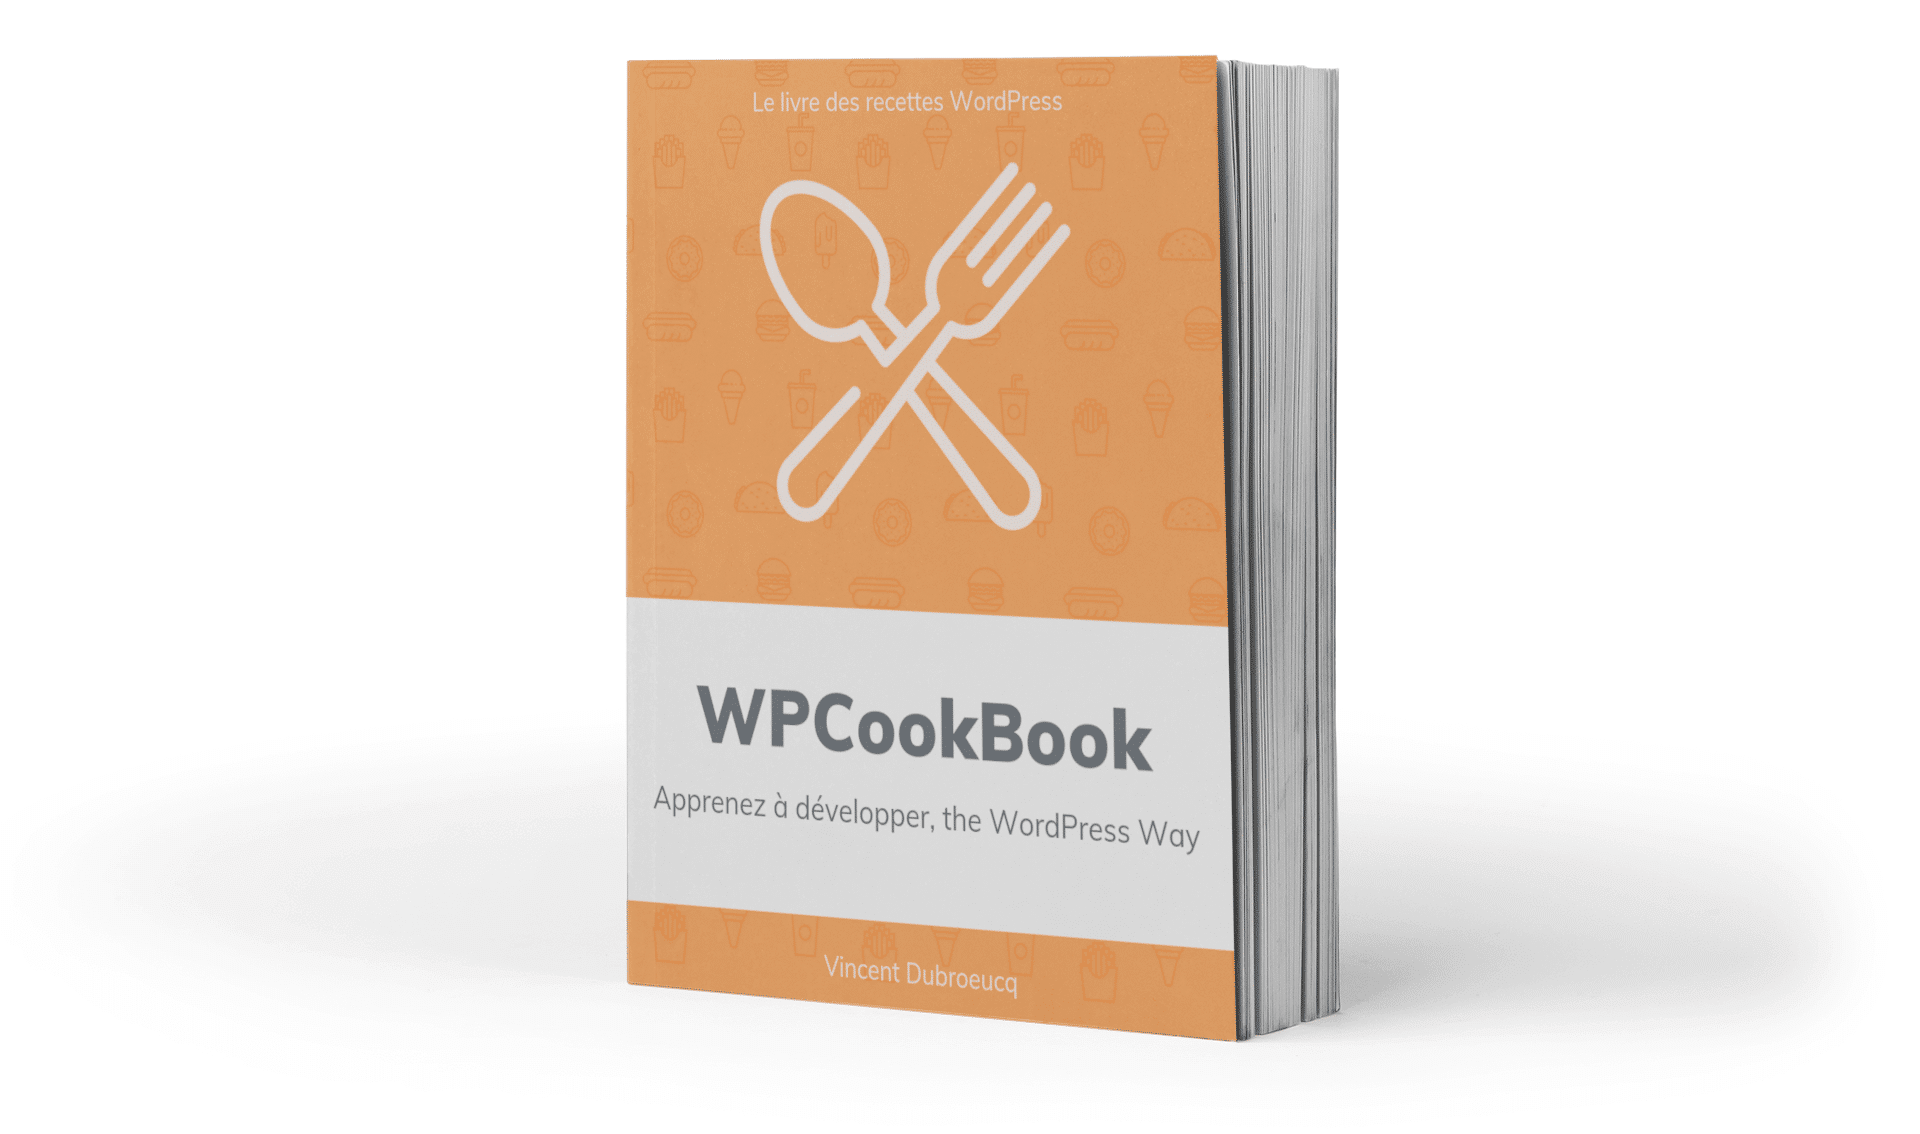 WPCookBook - Vincent Dubroeucq